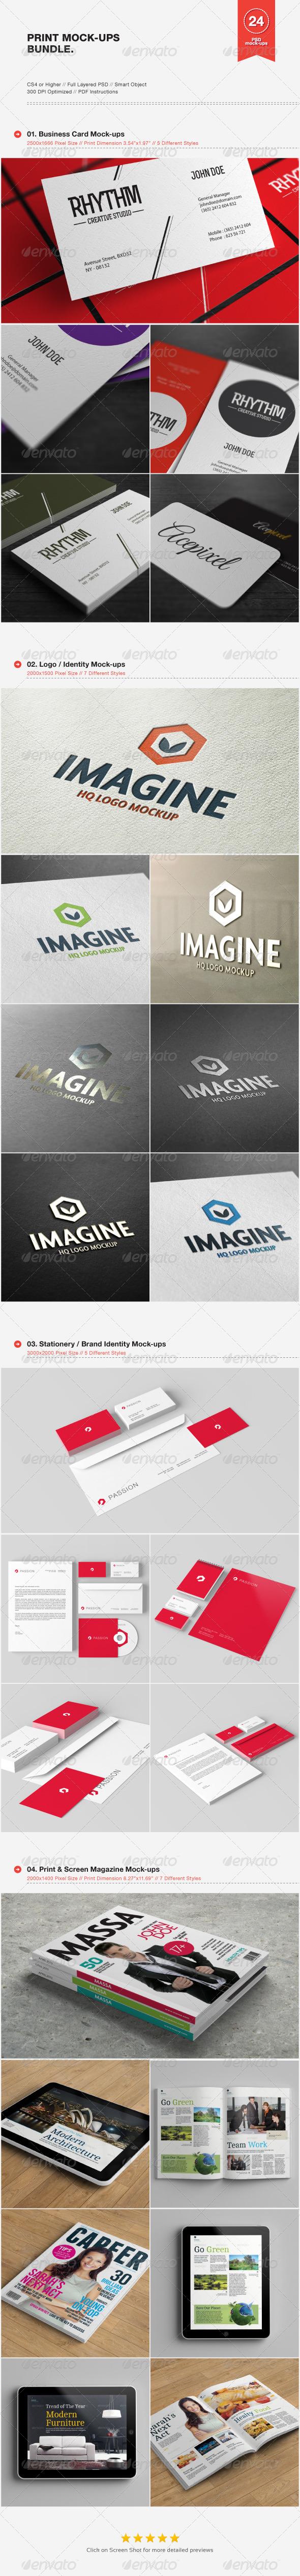 GraphicRiver Print Mock-ups Bundle 5309827